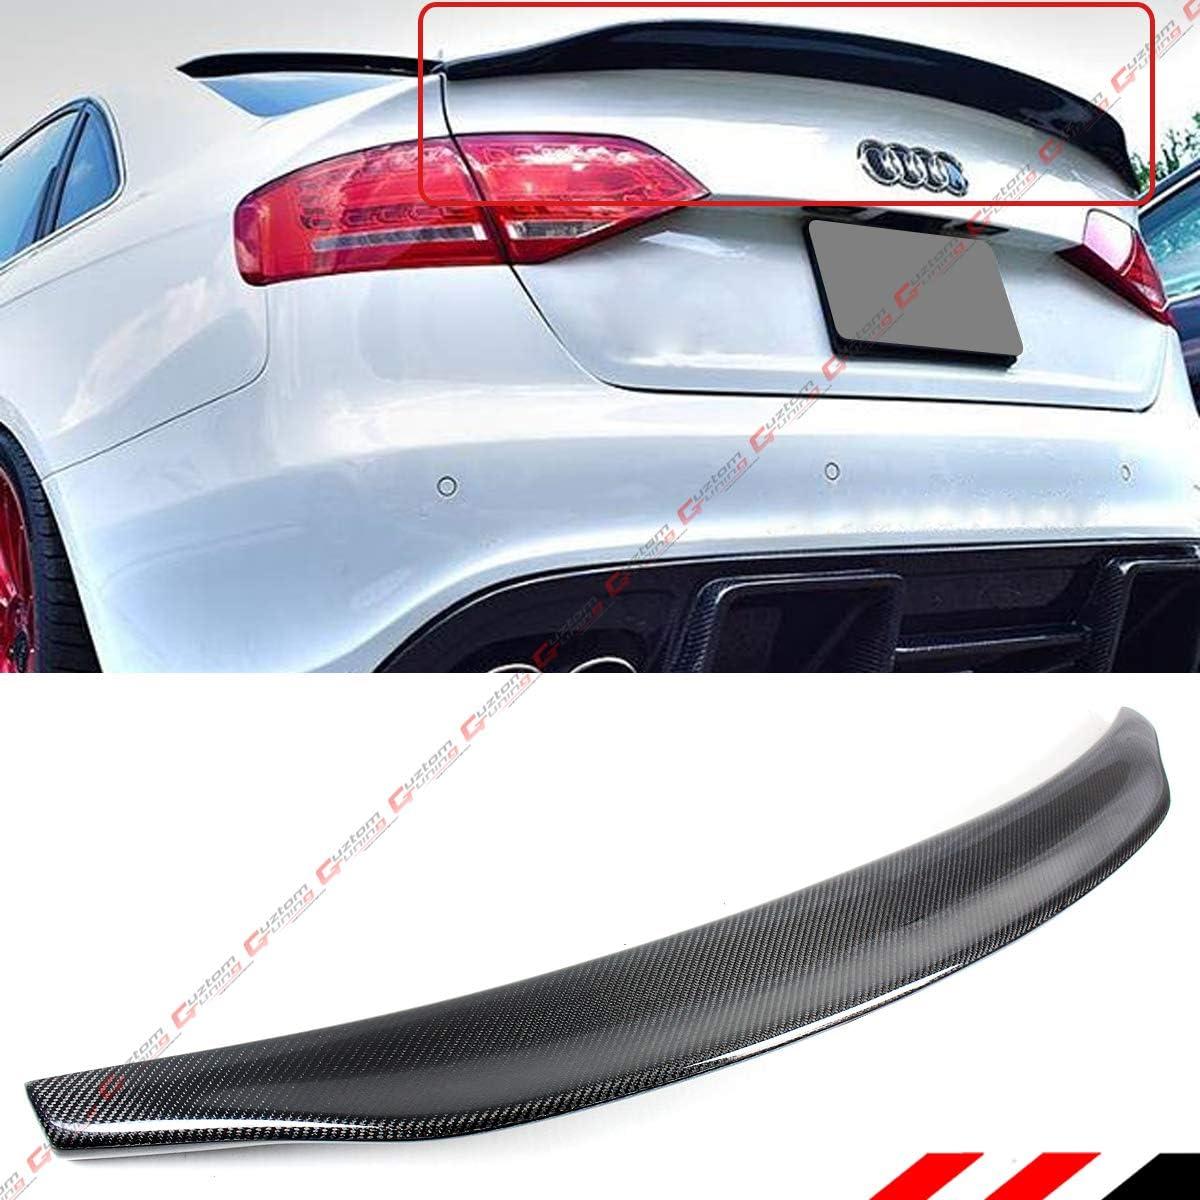 For AUDI A4 B8 B8.5 2009-2016 Rear Trunk Lip Spoiler Wing Painted phantom Black